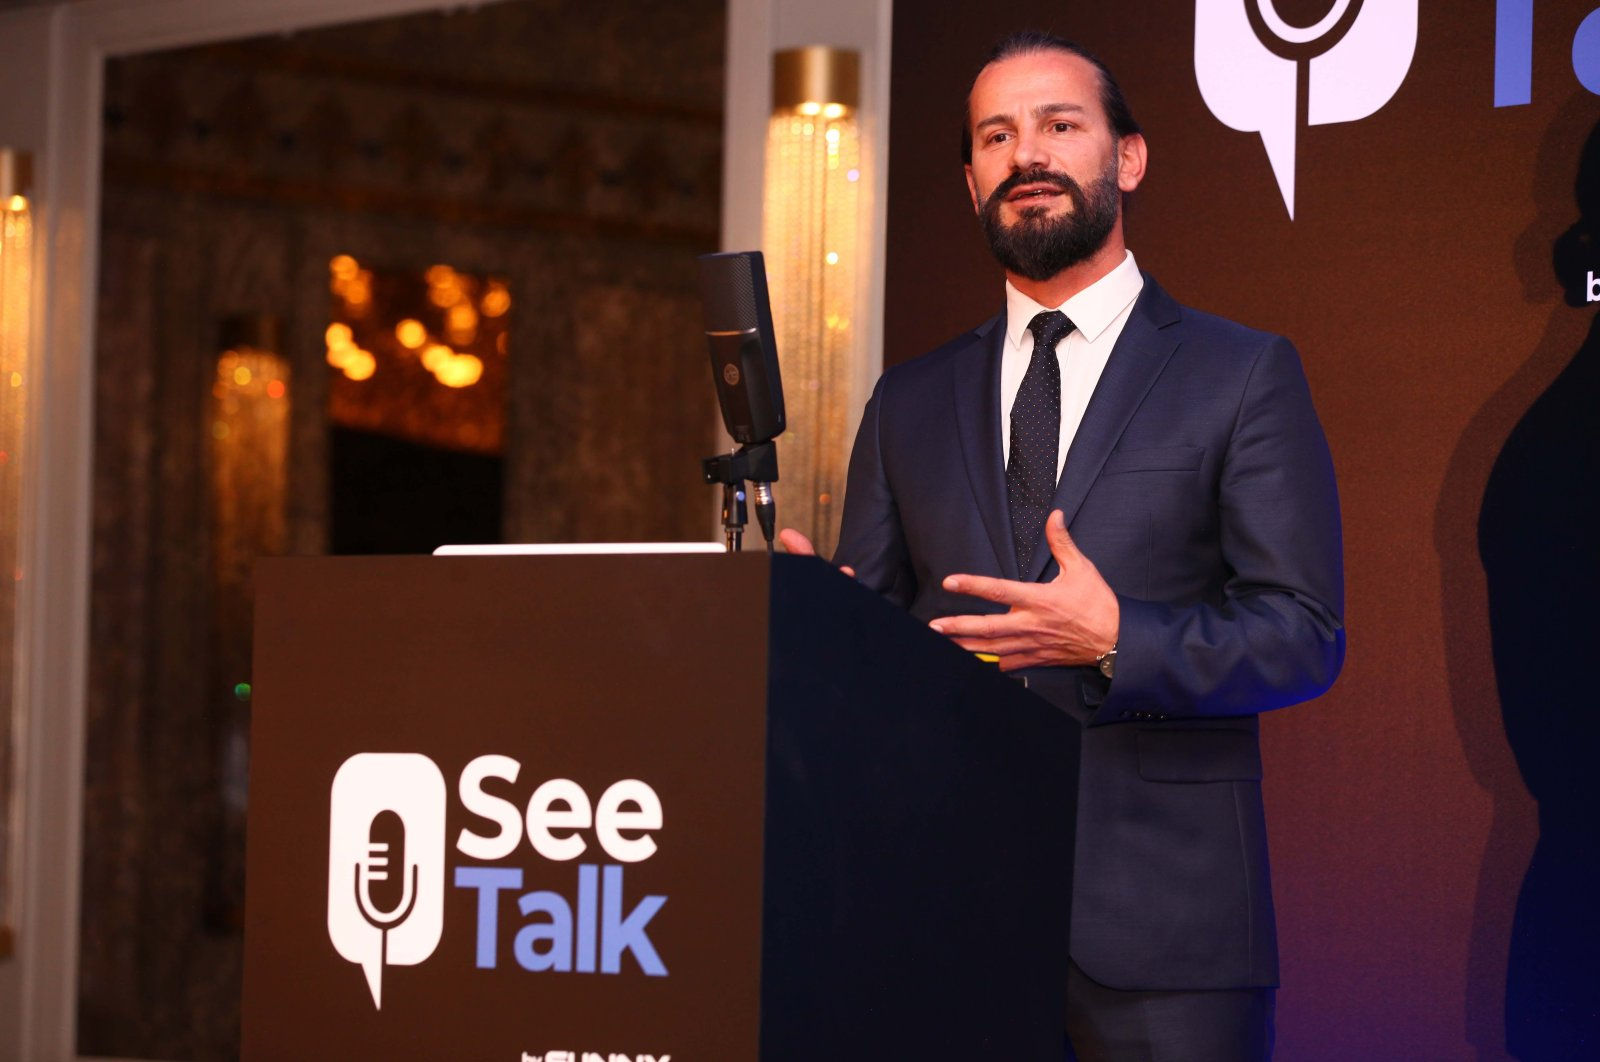 Arif Yıldırım, the Sunny electronic marketing and product category director, introduces the SeeTalk device, Istanbul, Turkey, March 3, 2021. (AA Photo)